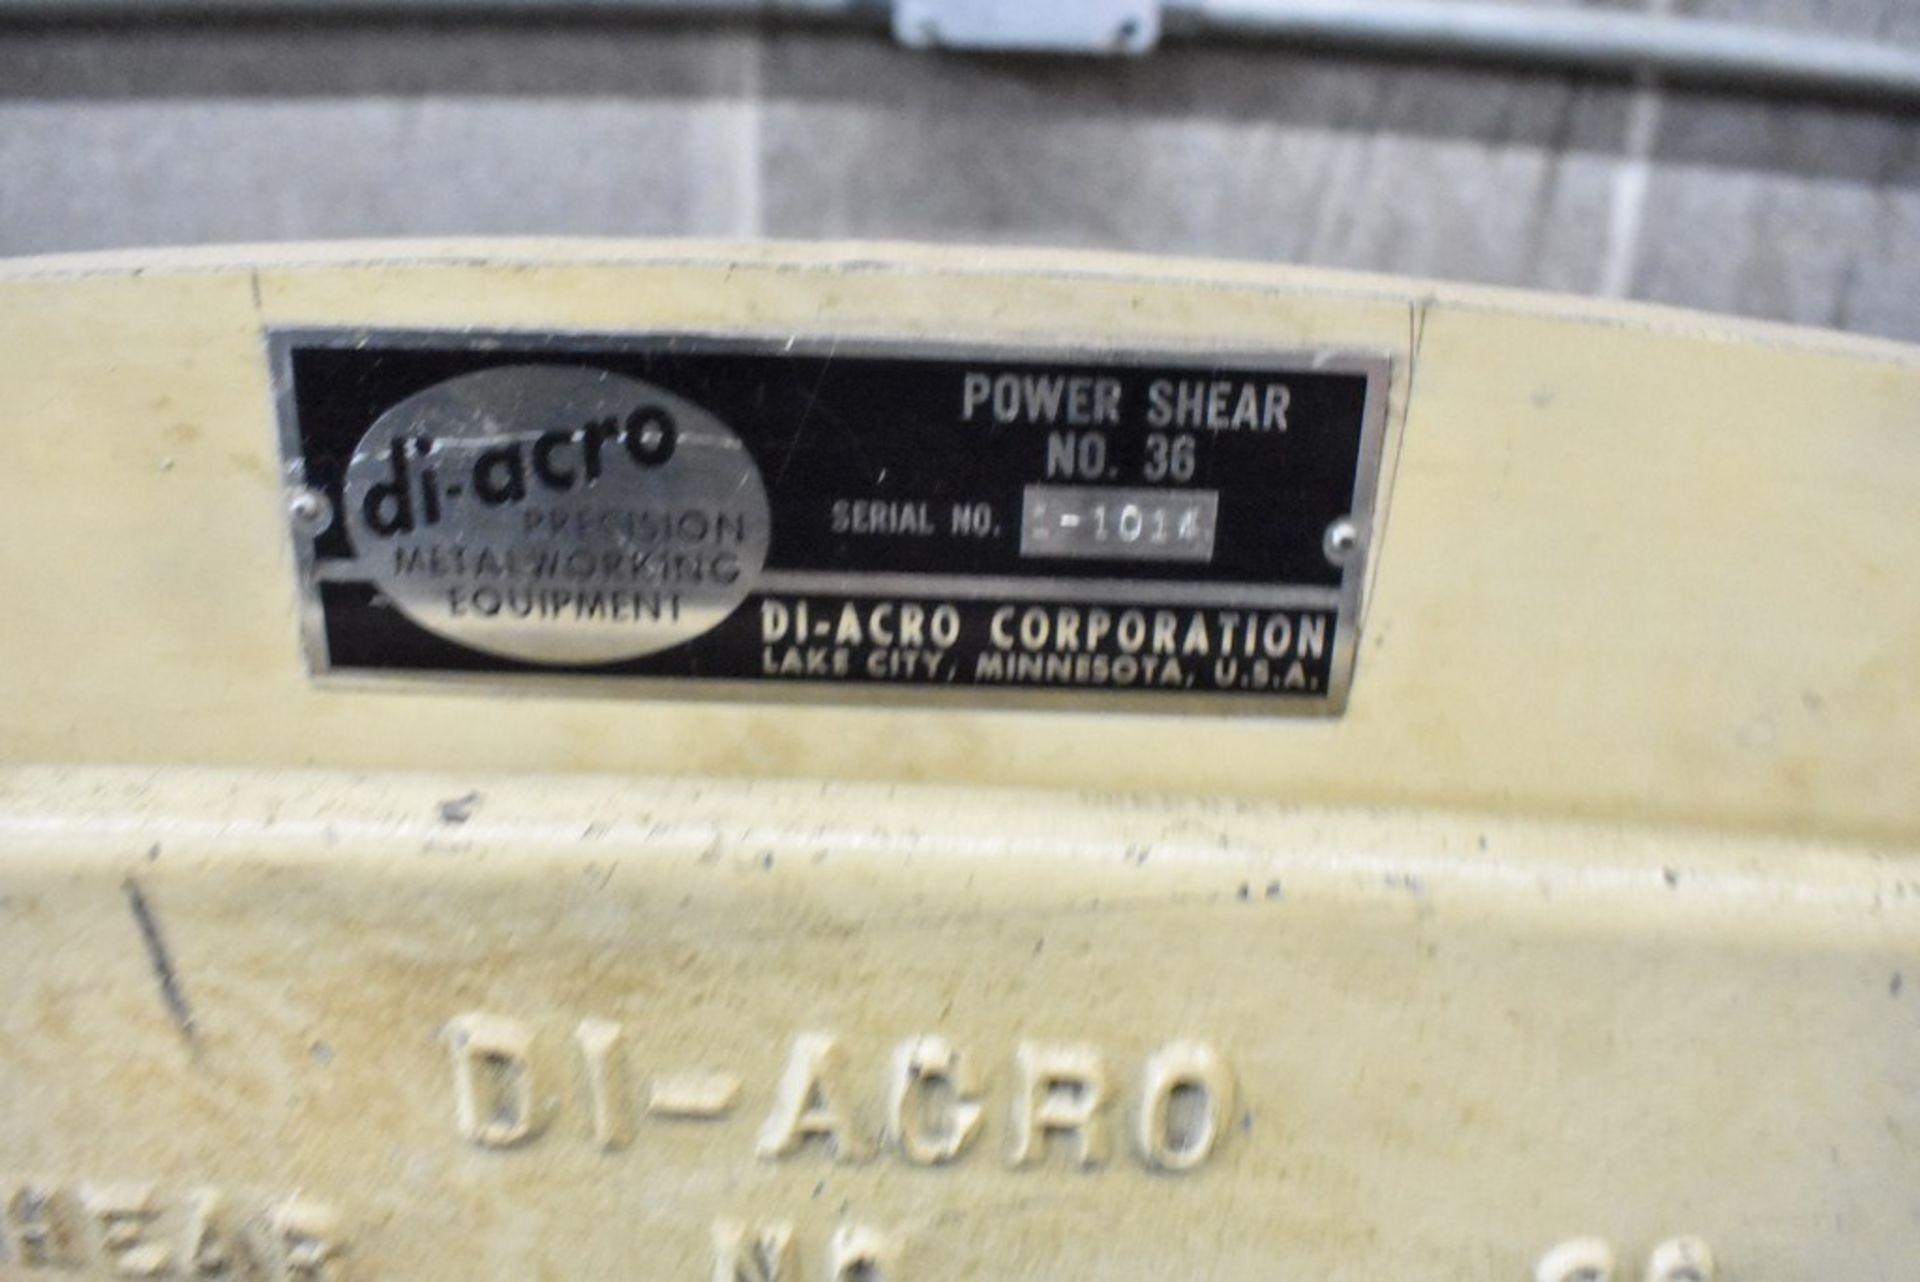 DI-ACRO NO. 36 POWER SHEAR, S/N 1-1014 - Image 2 of 7